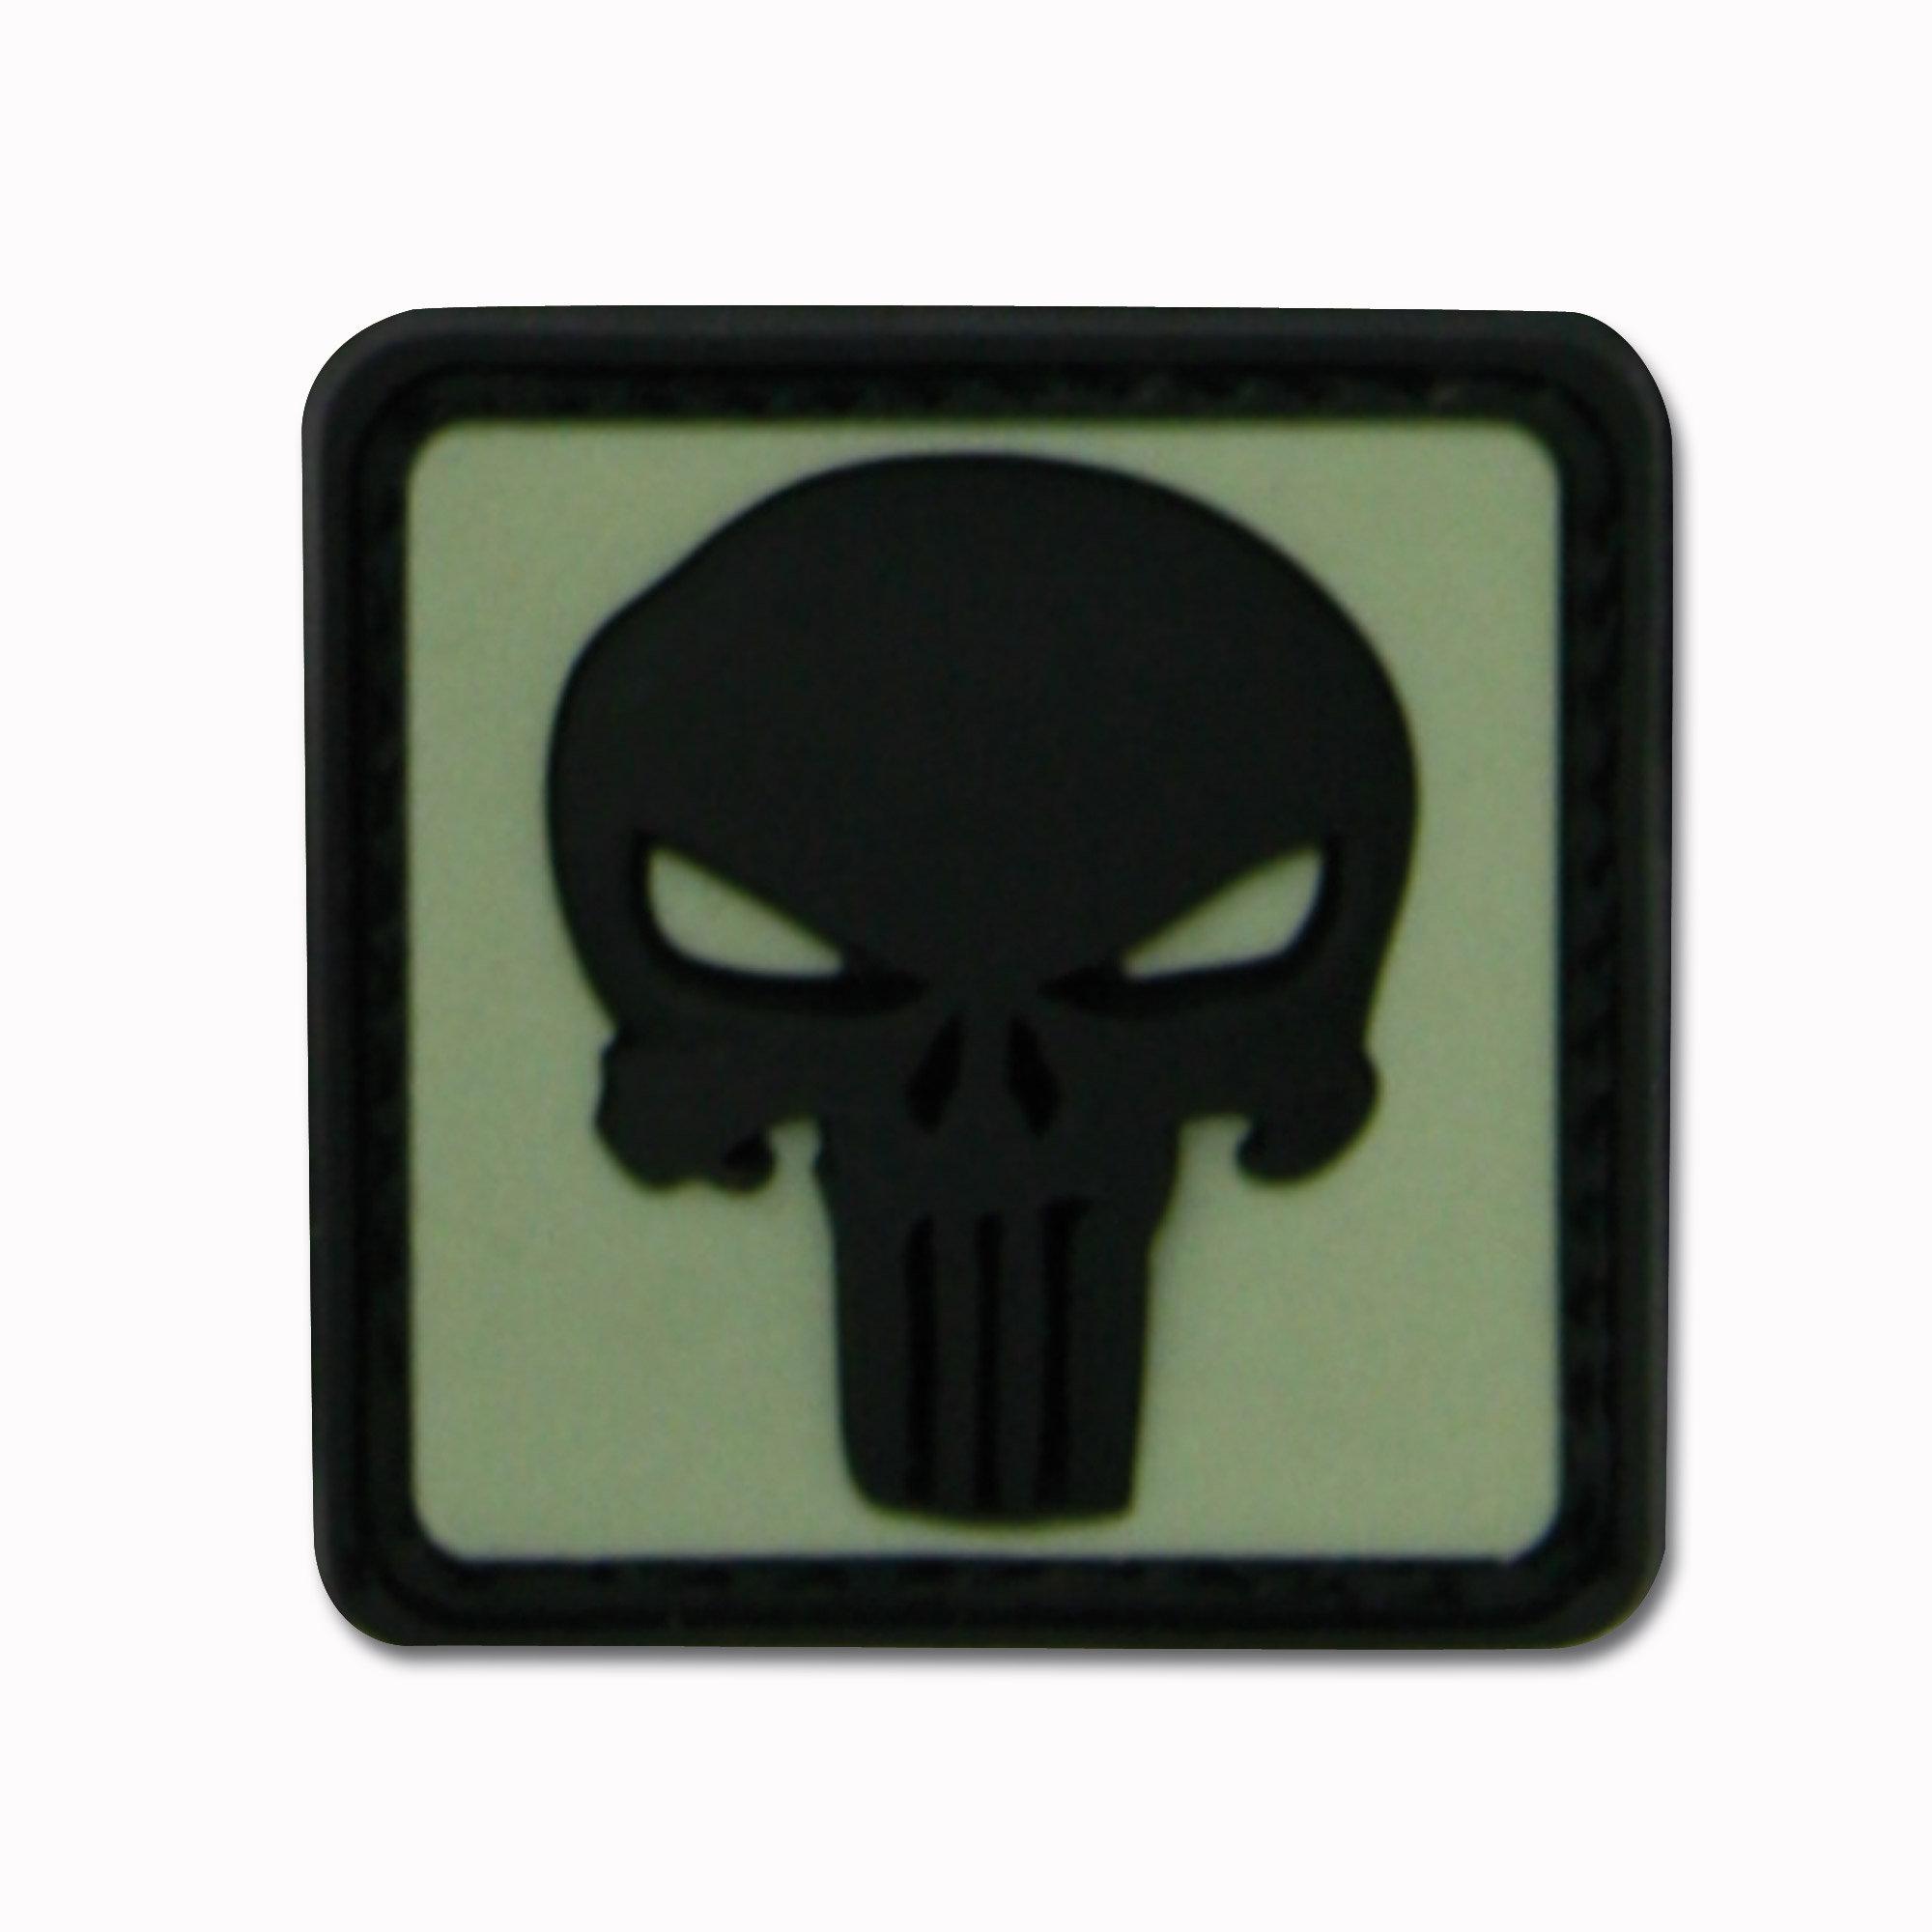 3D-Patch Punisher Skull nachleuchtend invers